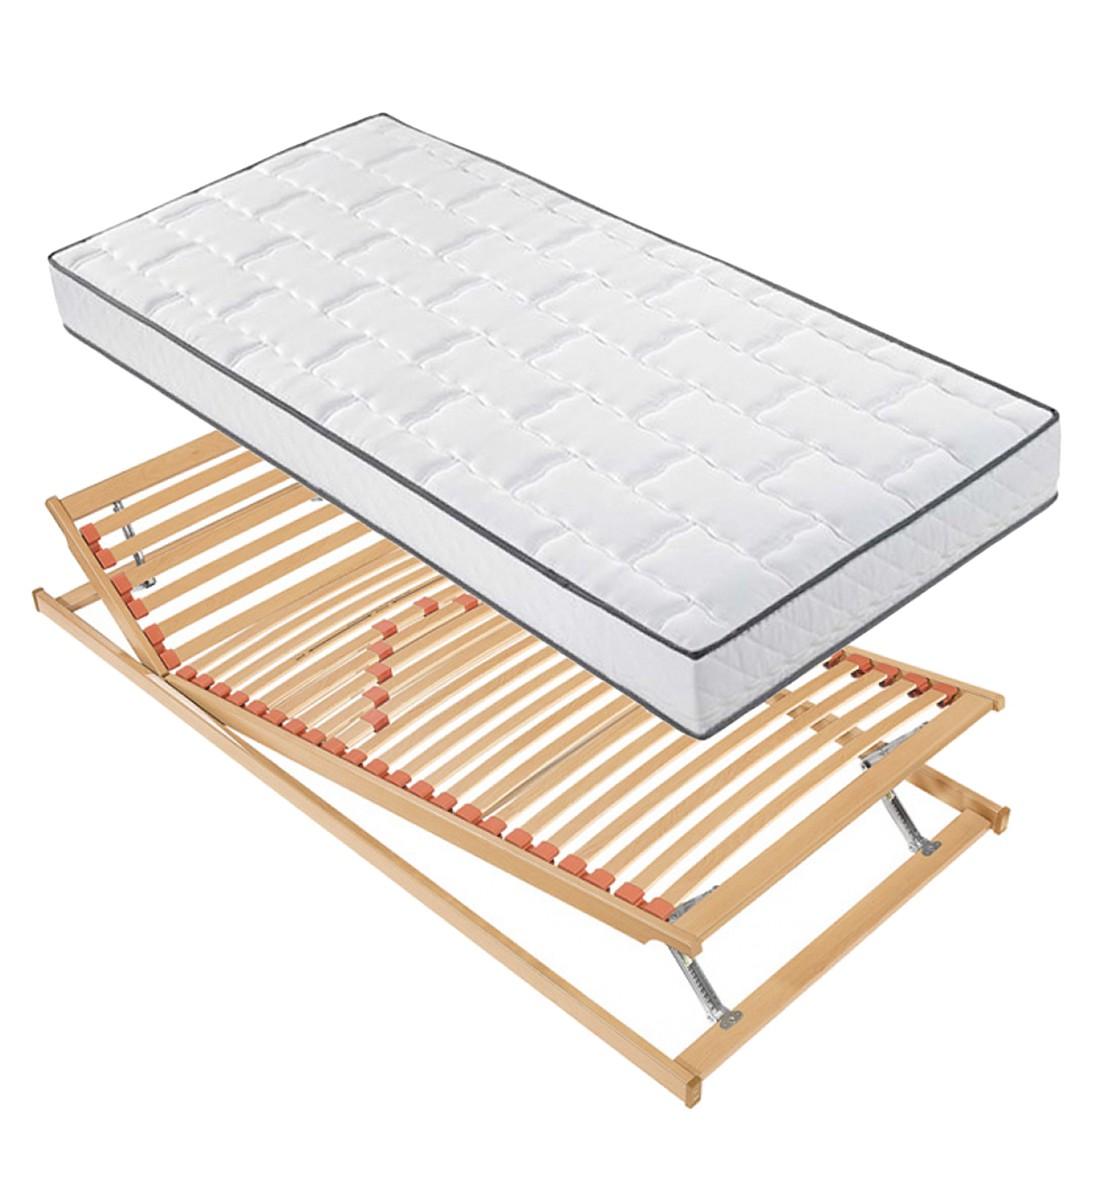 set i 7 zonen kaltschaummatratze lattenrost chill novel 80 x 200 cm arte m kaufen. Black Bedroom Furniture Sets. Home Design Ideas